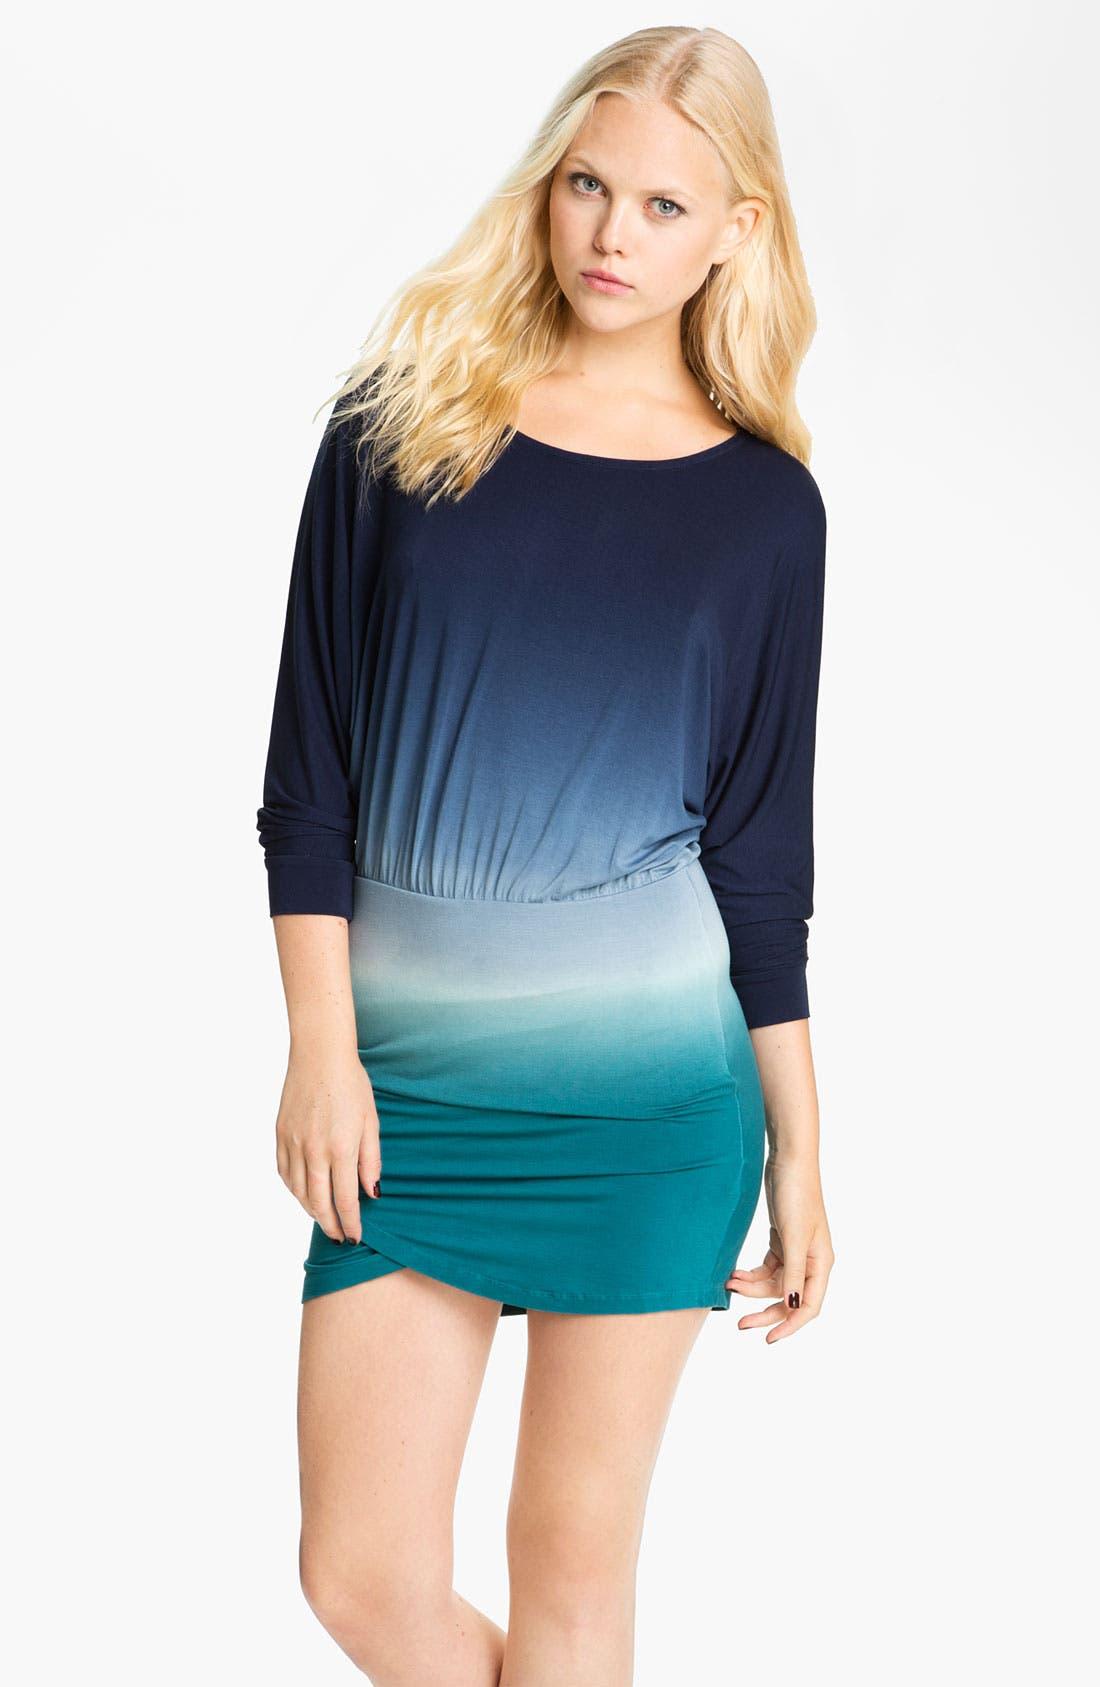 Alternate Image 1 Selected - Young, Fabulous & Broke 'Heidi' Tie Dye Dolman Dress